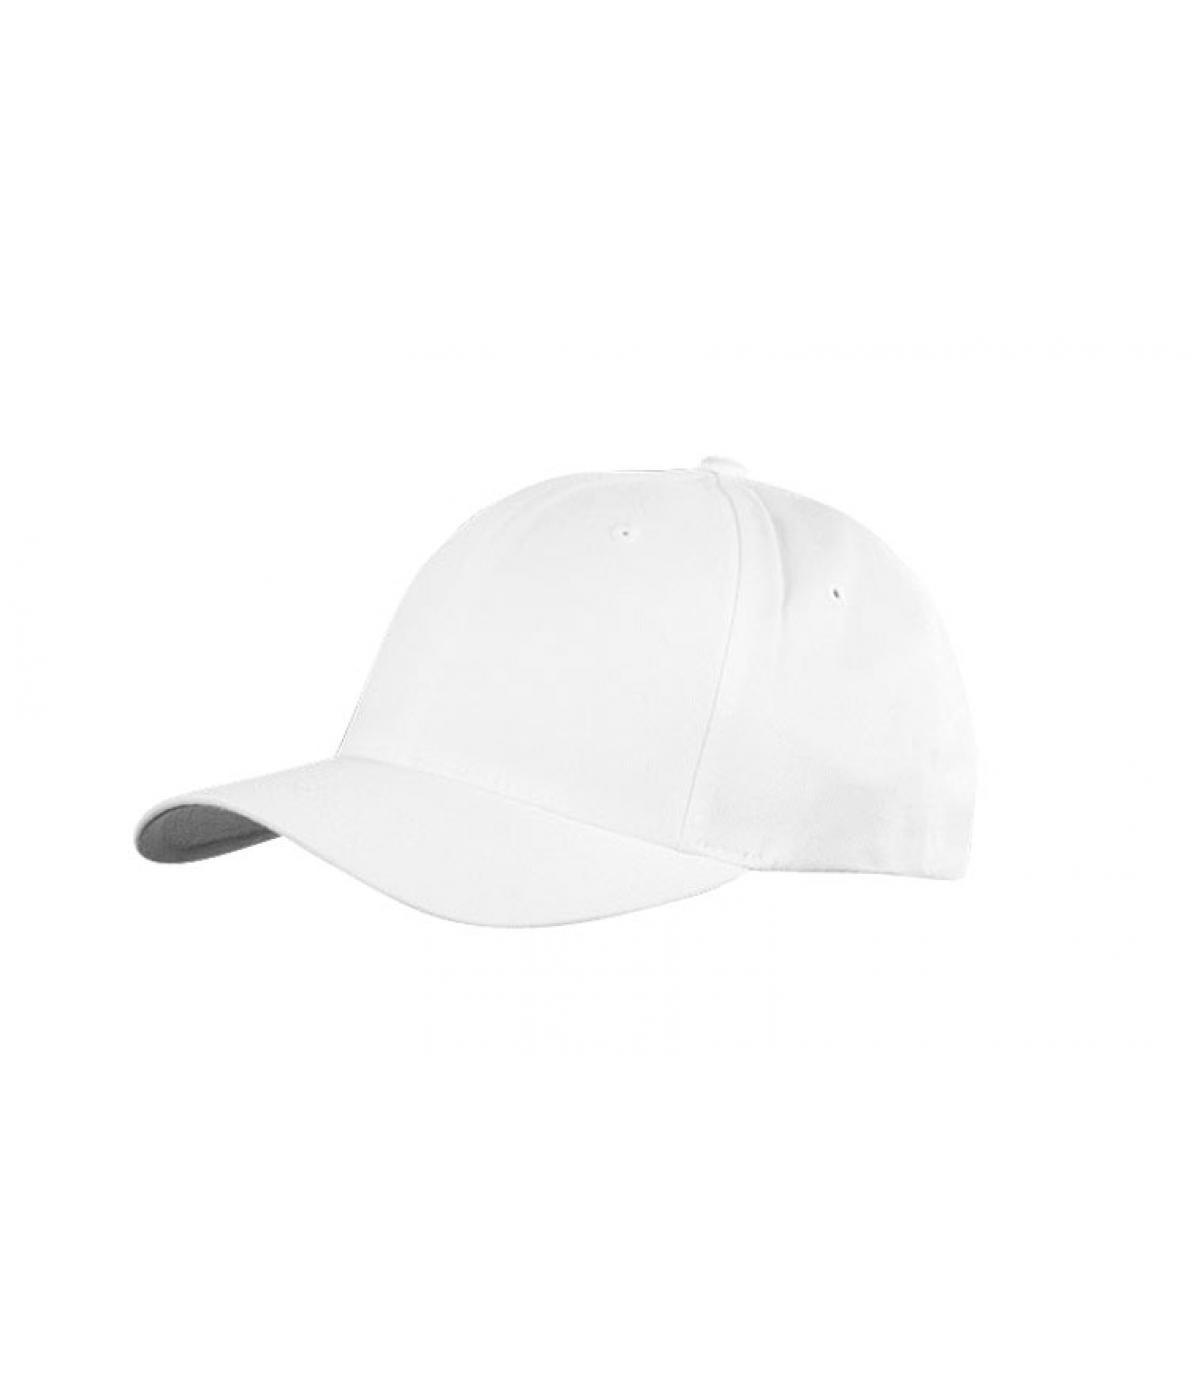 Flexfit cap white